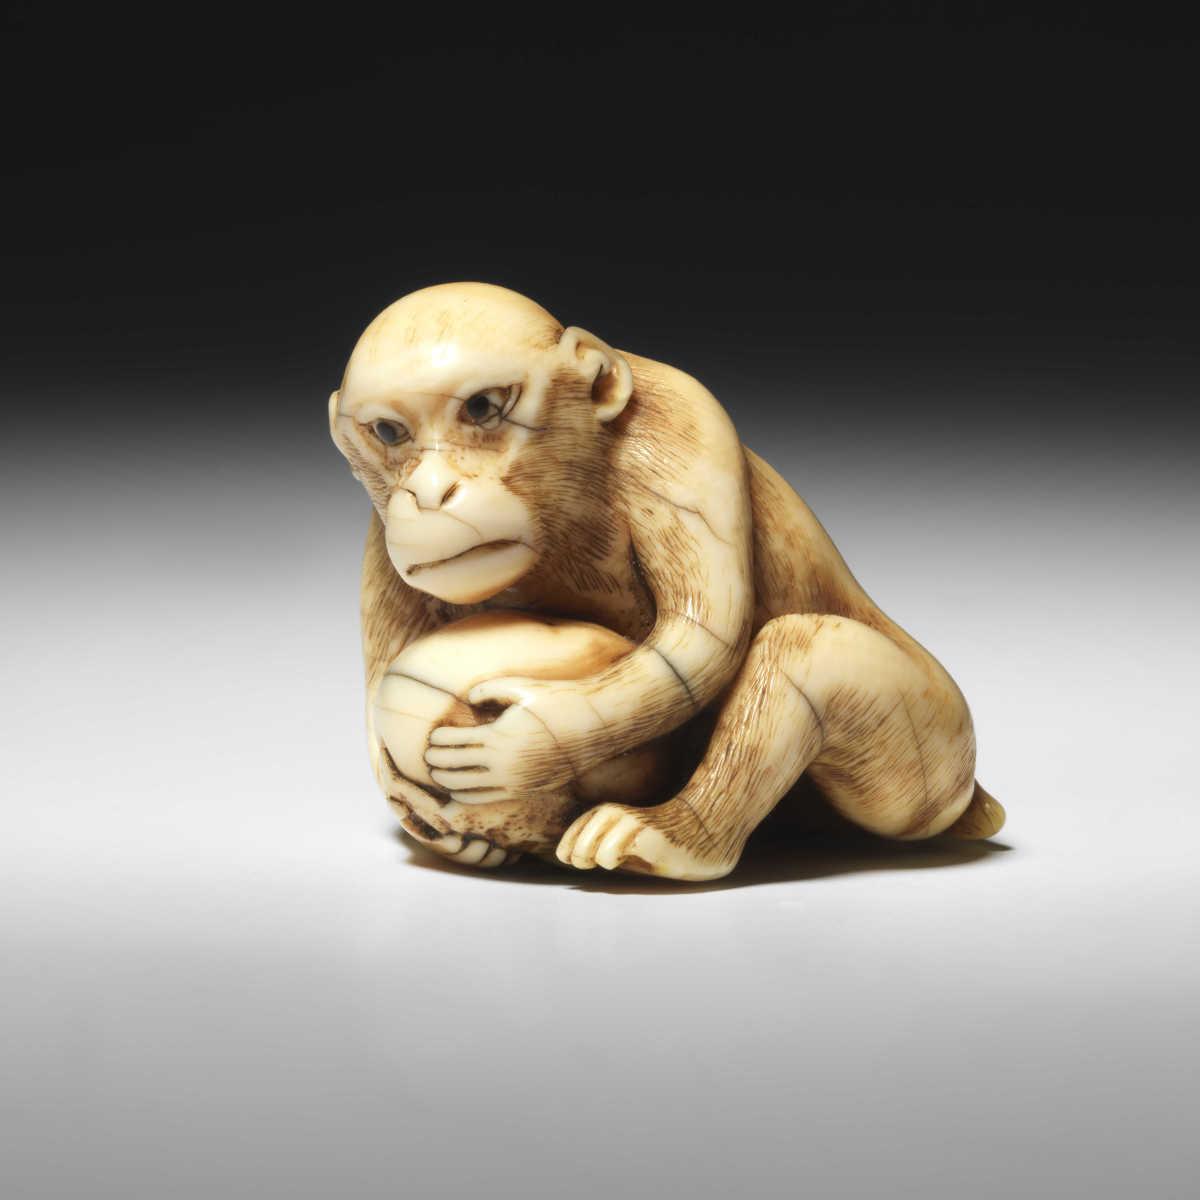 Rantei Ivory Netsuke of a Monkey with Kaki